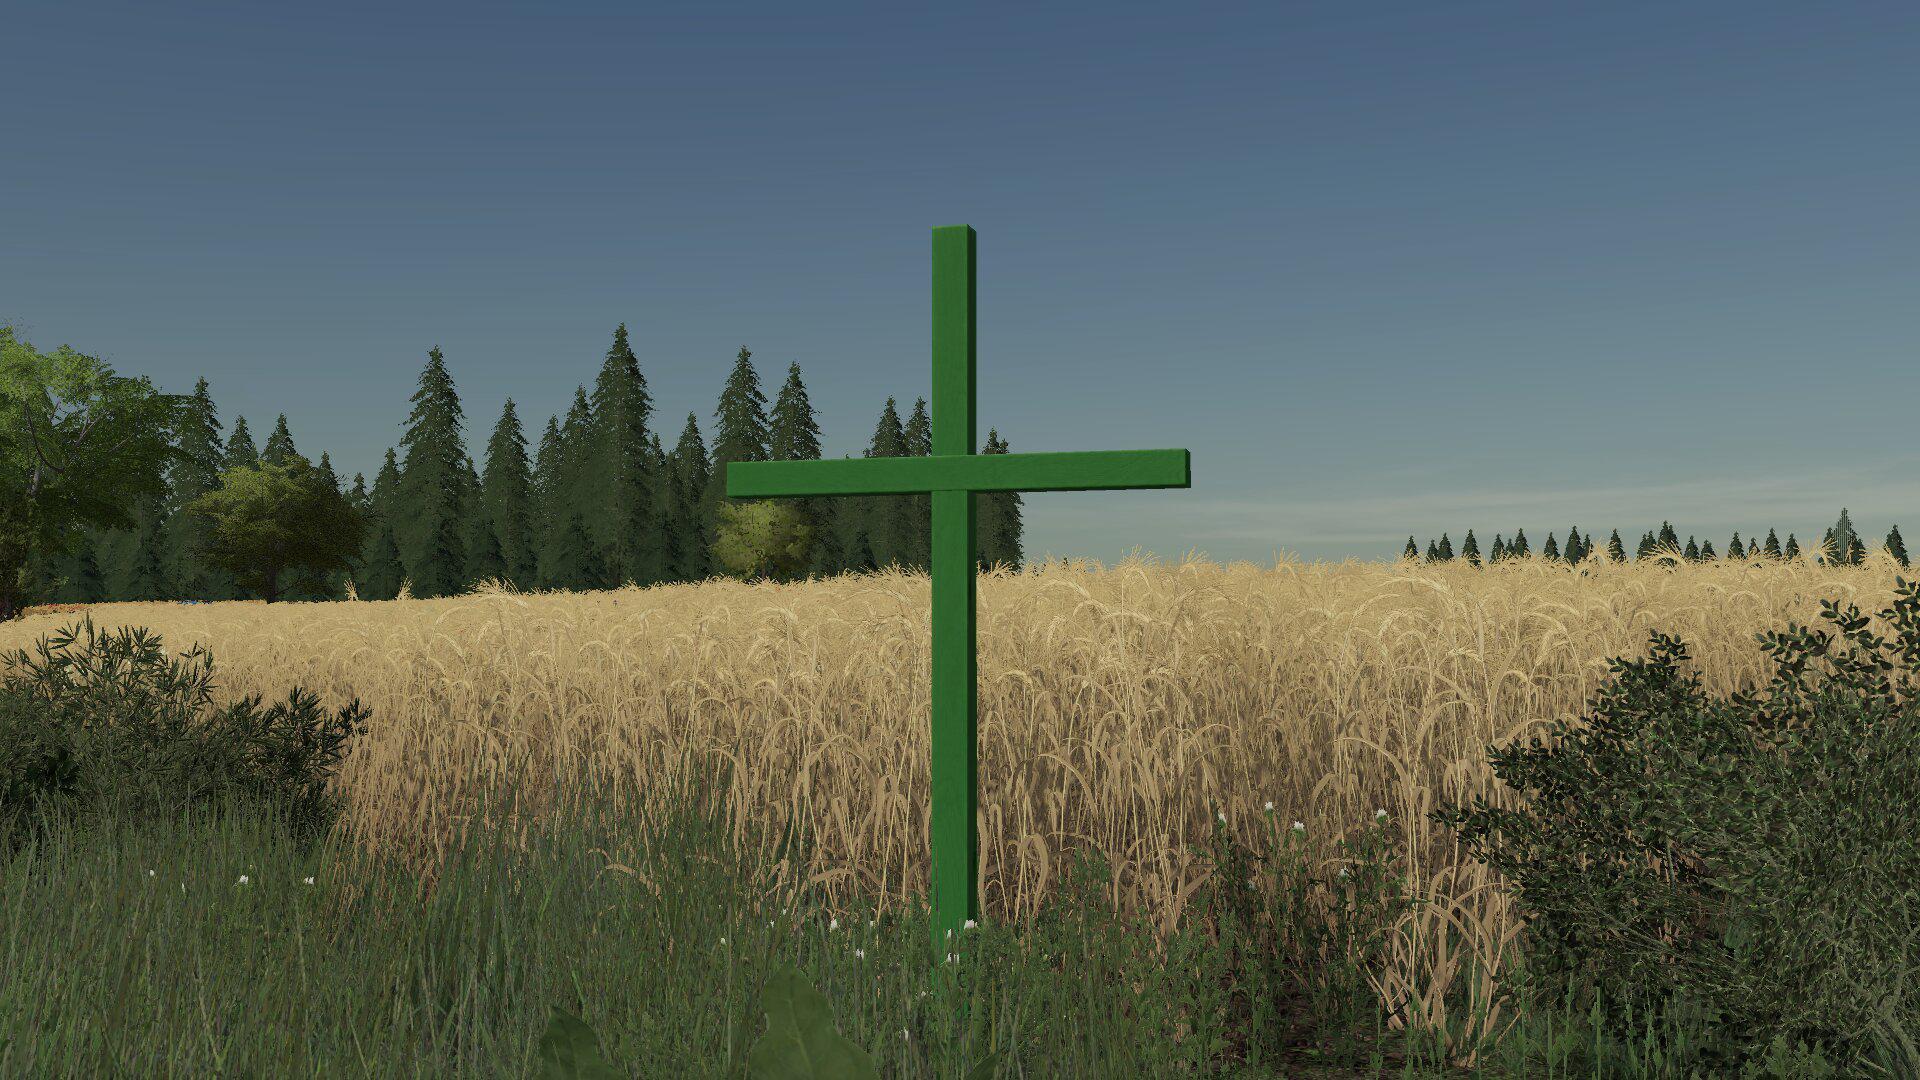 Grünes Kreuz Im Feld